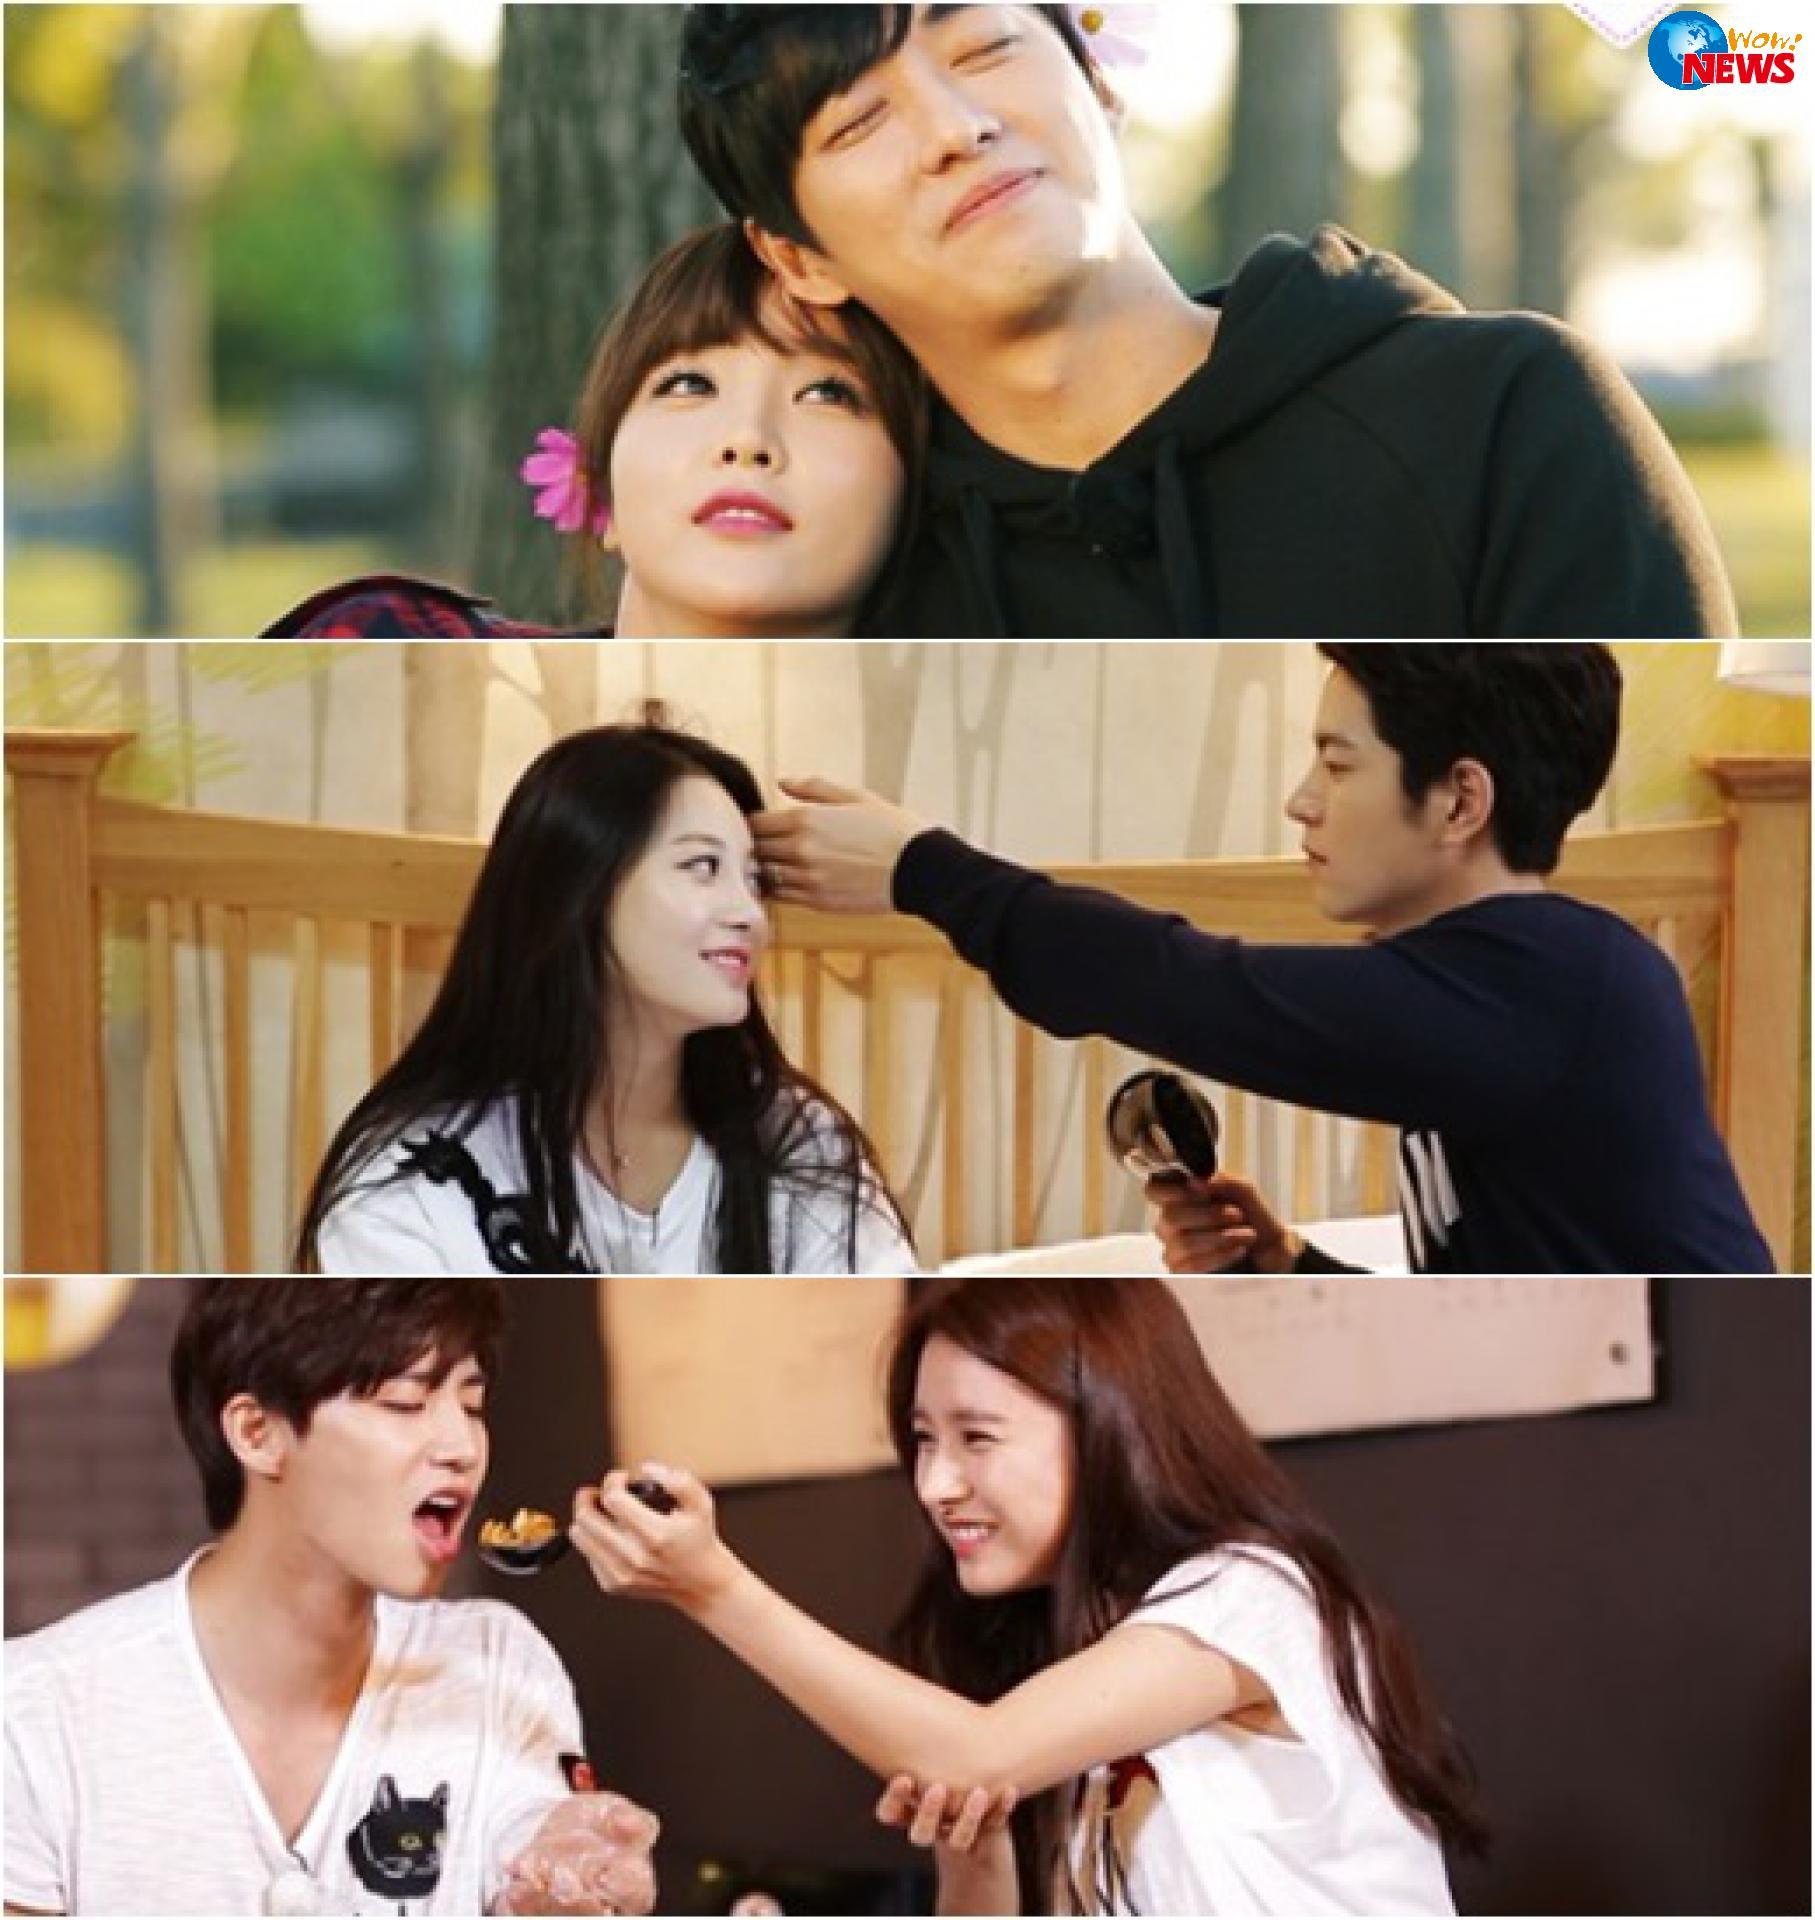 bnt新闻讯 mbc综艺节目「我们结婚了」第四季的人气超越了韩国国境